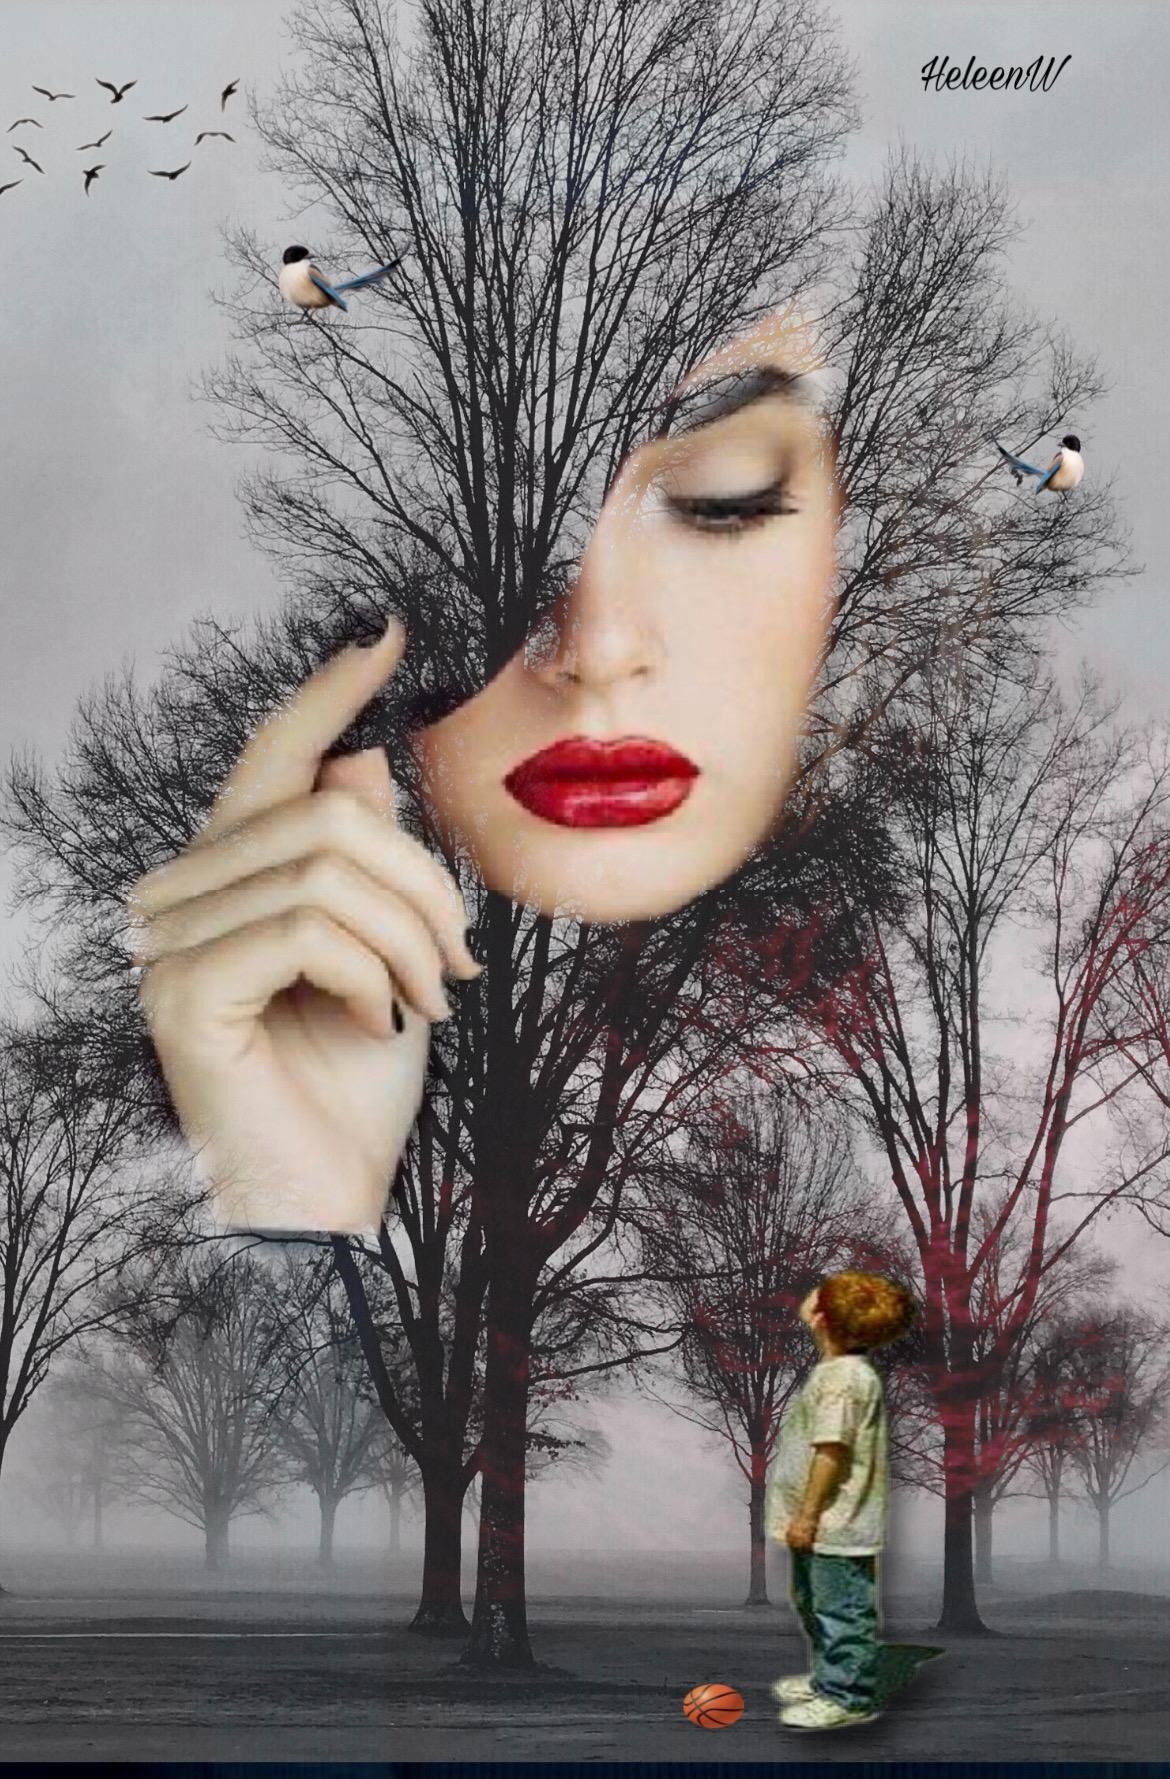 #doubleexposures #fantasy #imagination #lady #beautifullady #trees #forest #bird #boy #kid #playingwithpicsart #creative #creativity #diversity #freetoedit